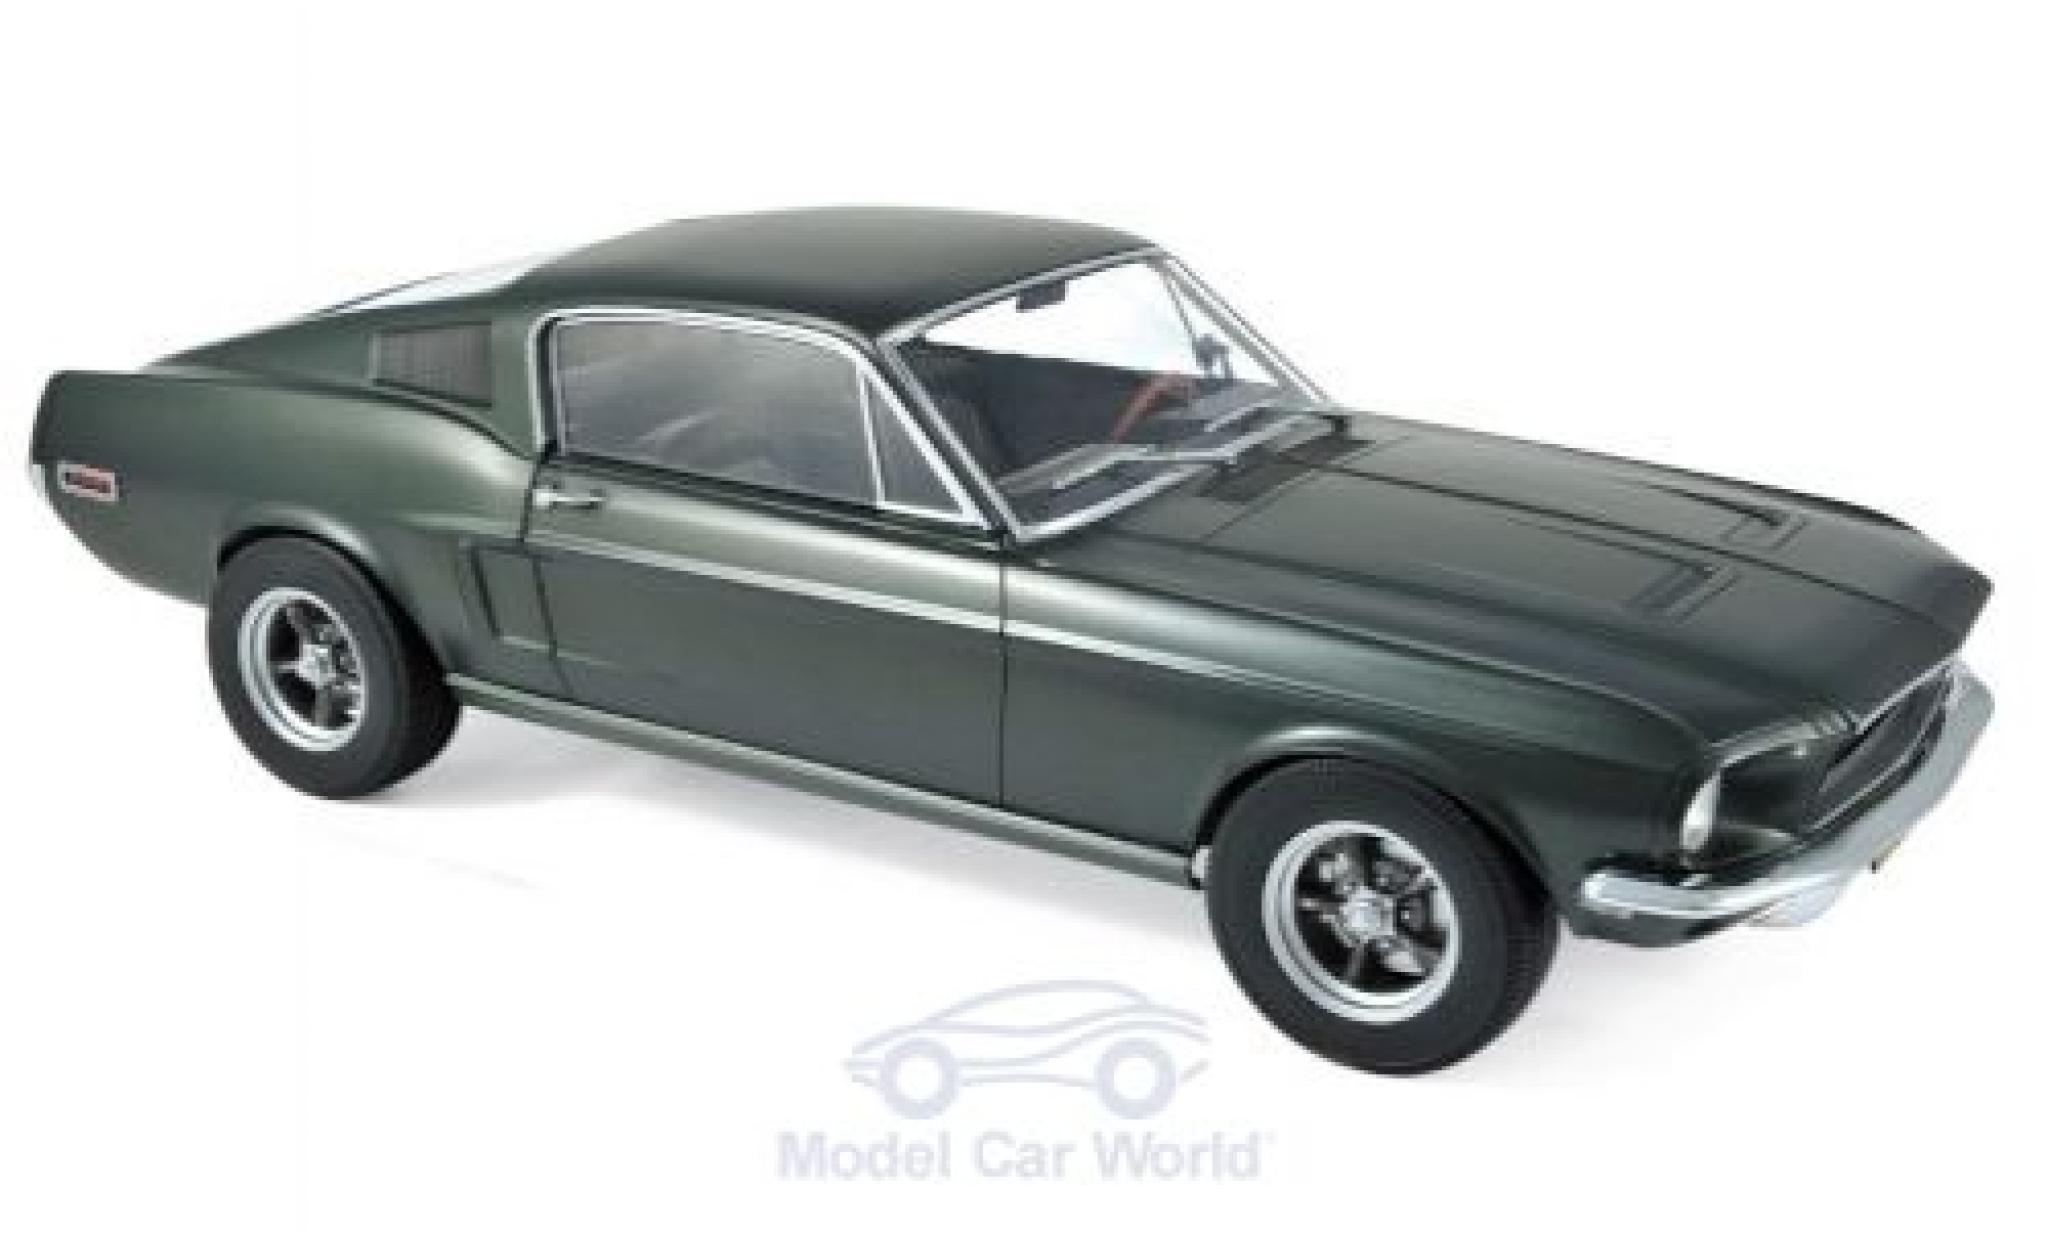 Ford Mustang 1/12 Norev Fastback metallic green 1968